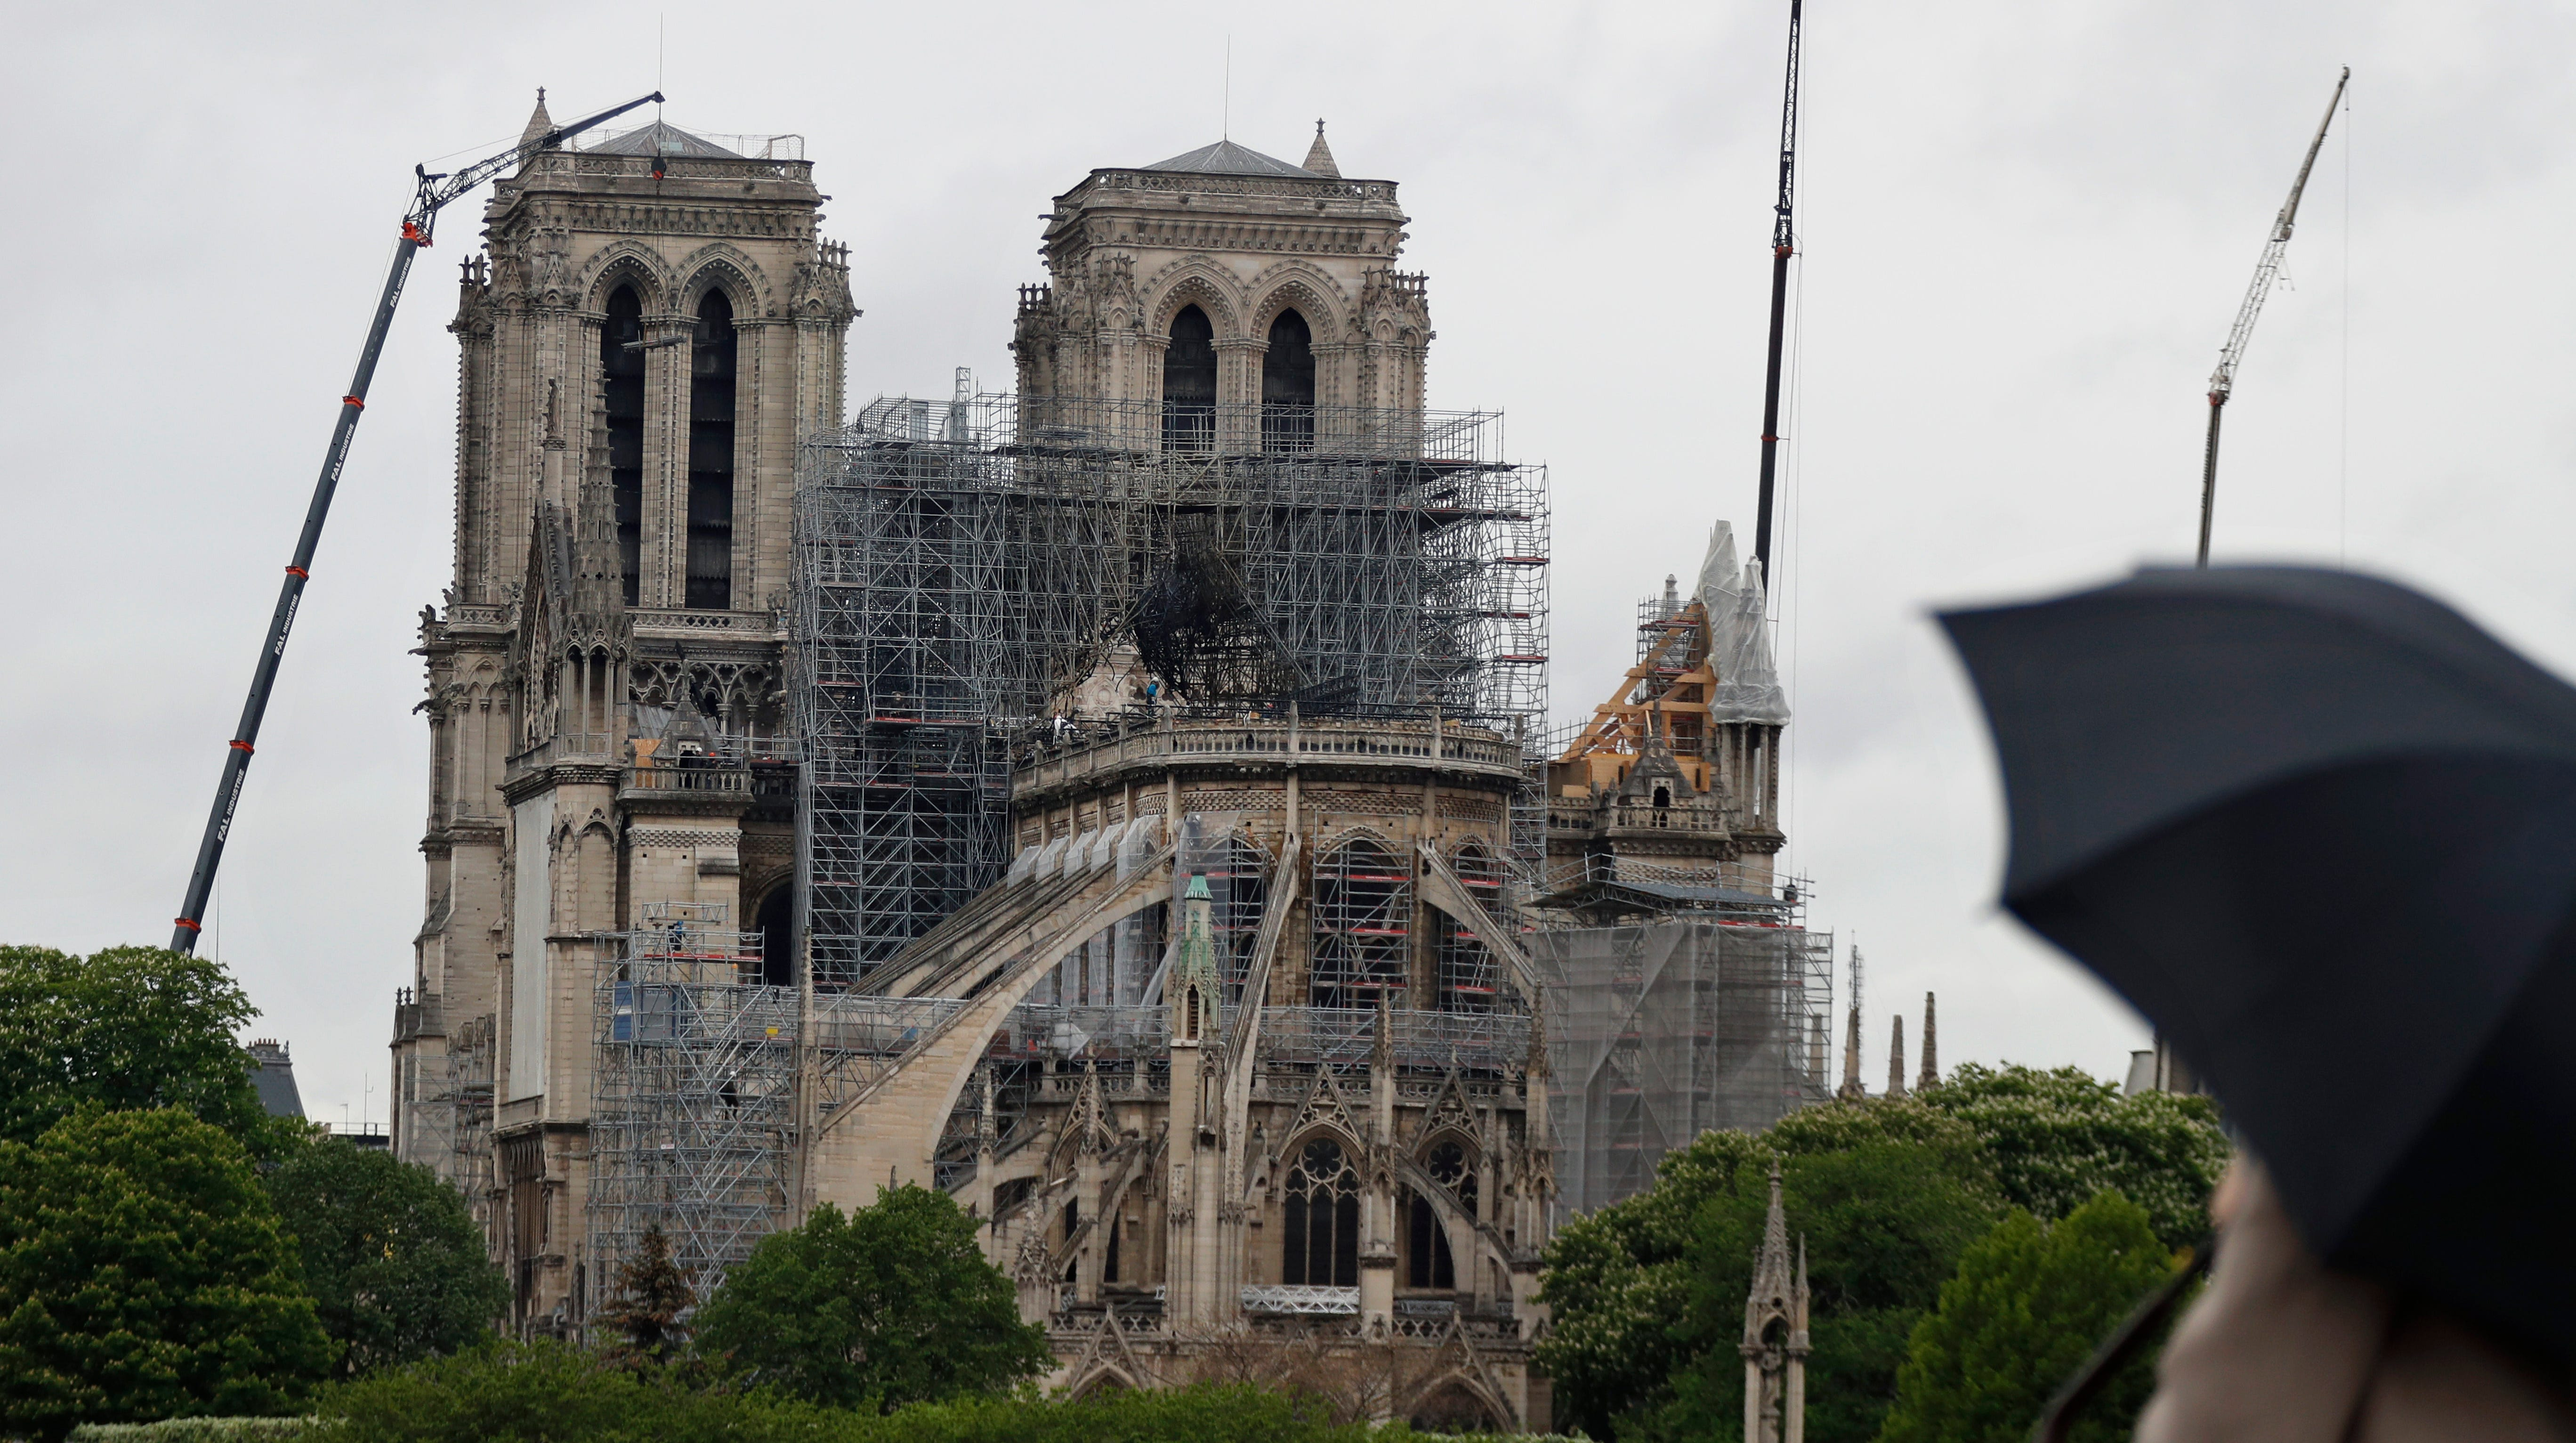 To restore Notre Dame, we must restore its fundamental purpose